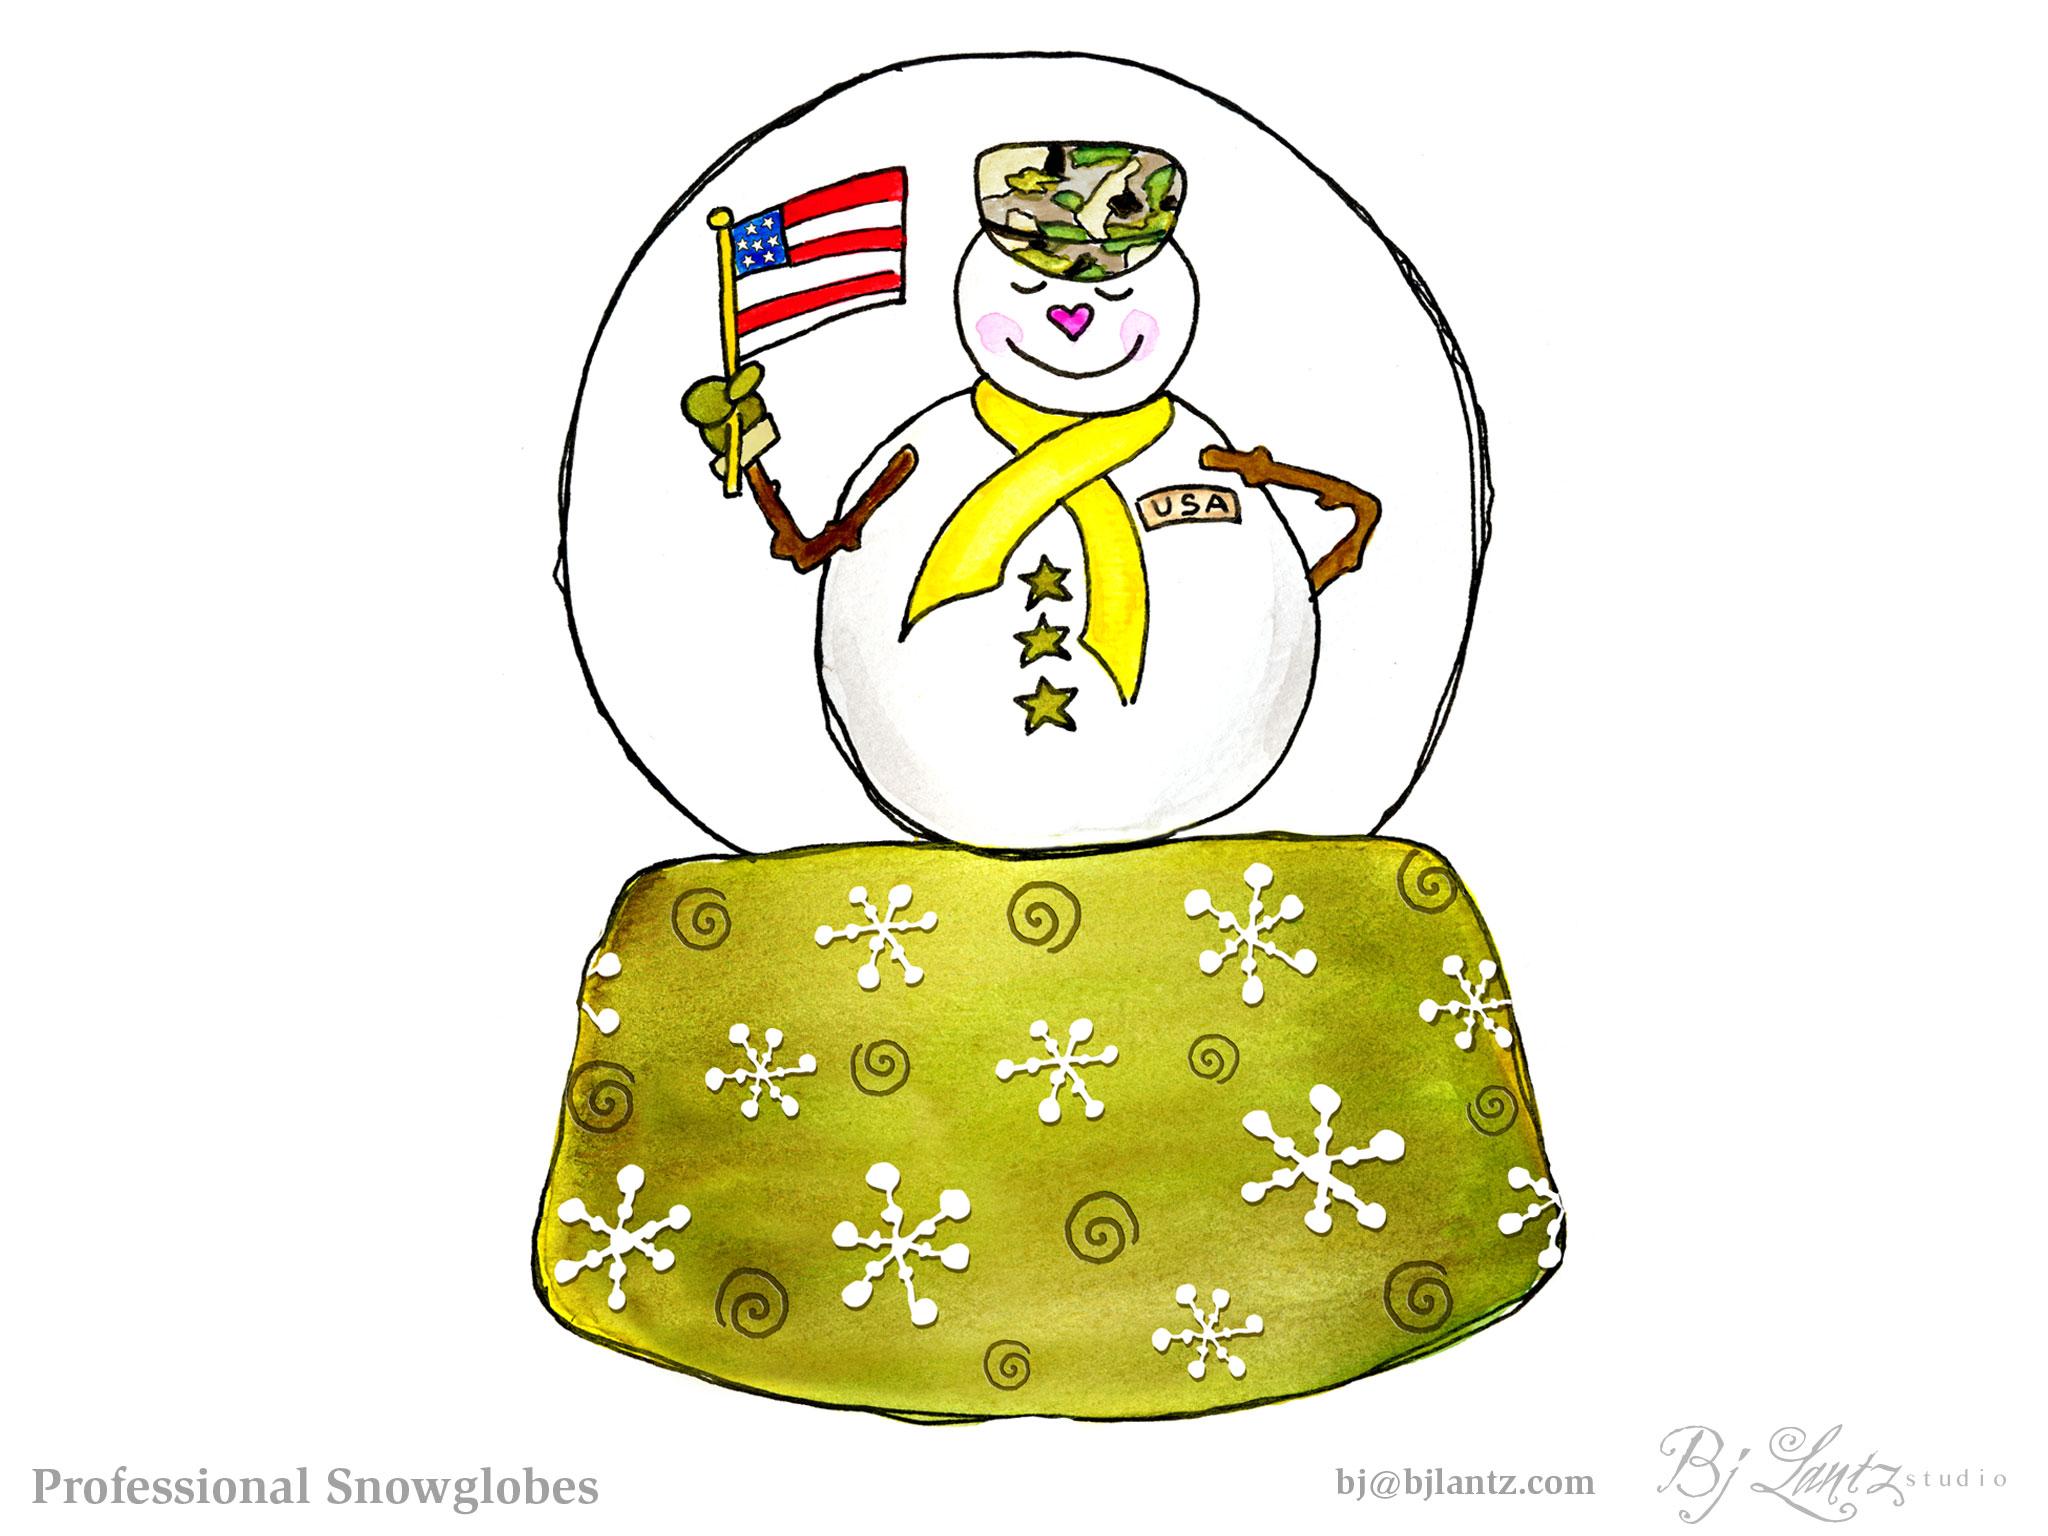 Snowglobes_pros_portfolio_5.jpg